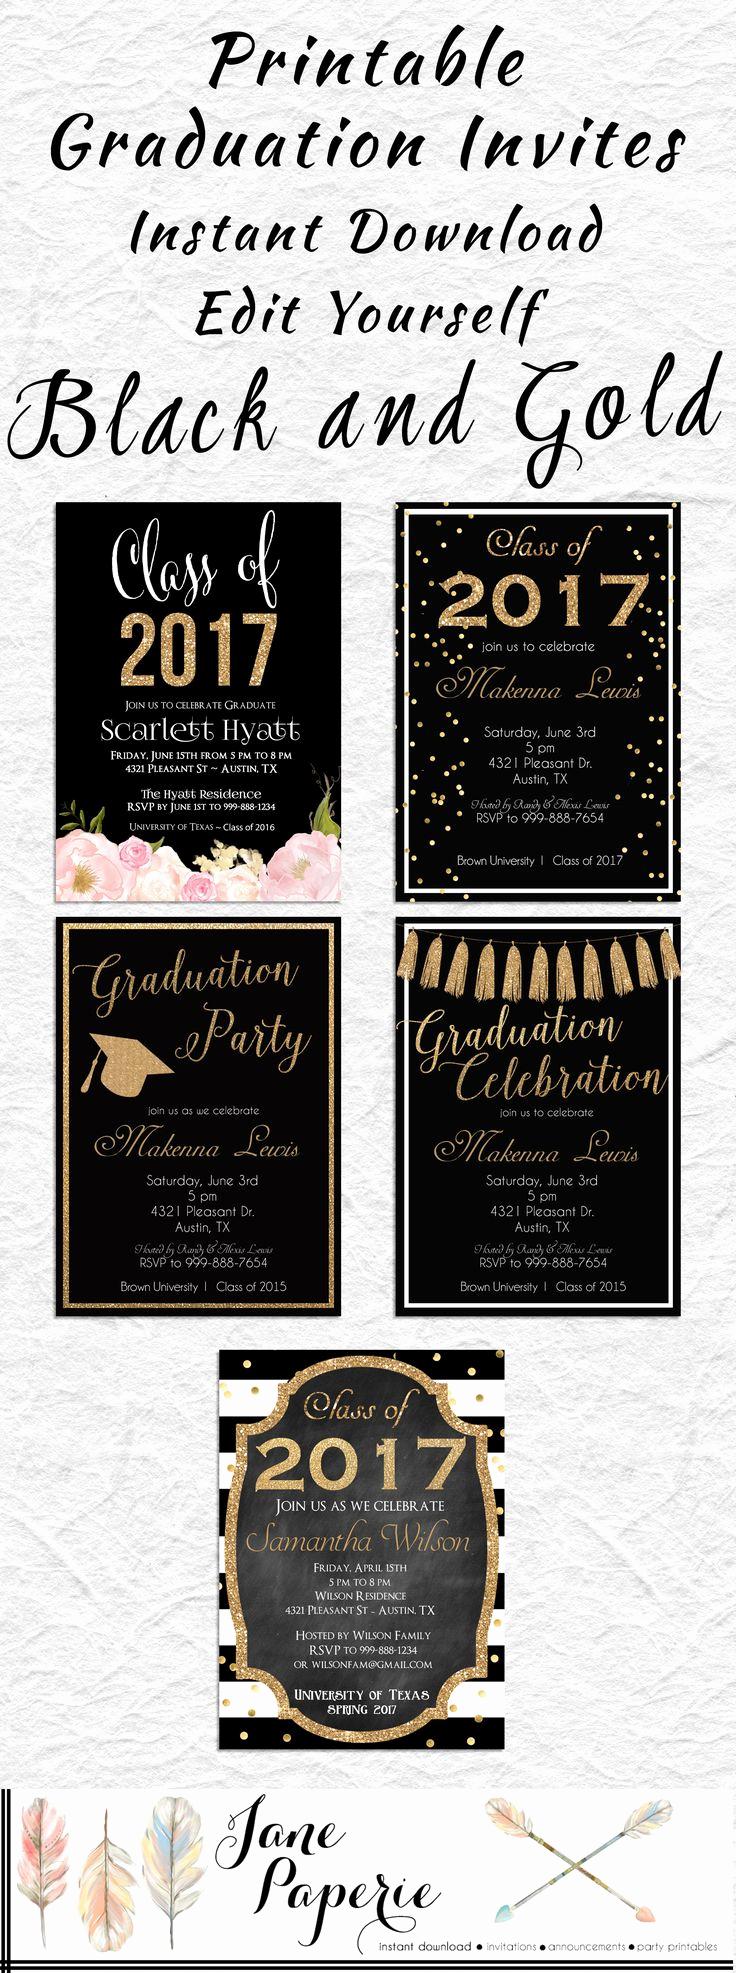 Grad Party Invitation Ideas Unique Best 25 High School Graduation Invitations Ideas On